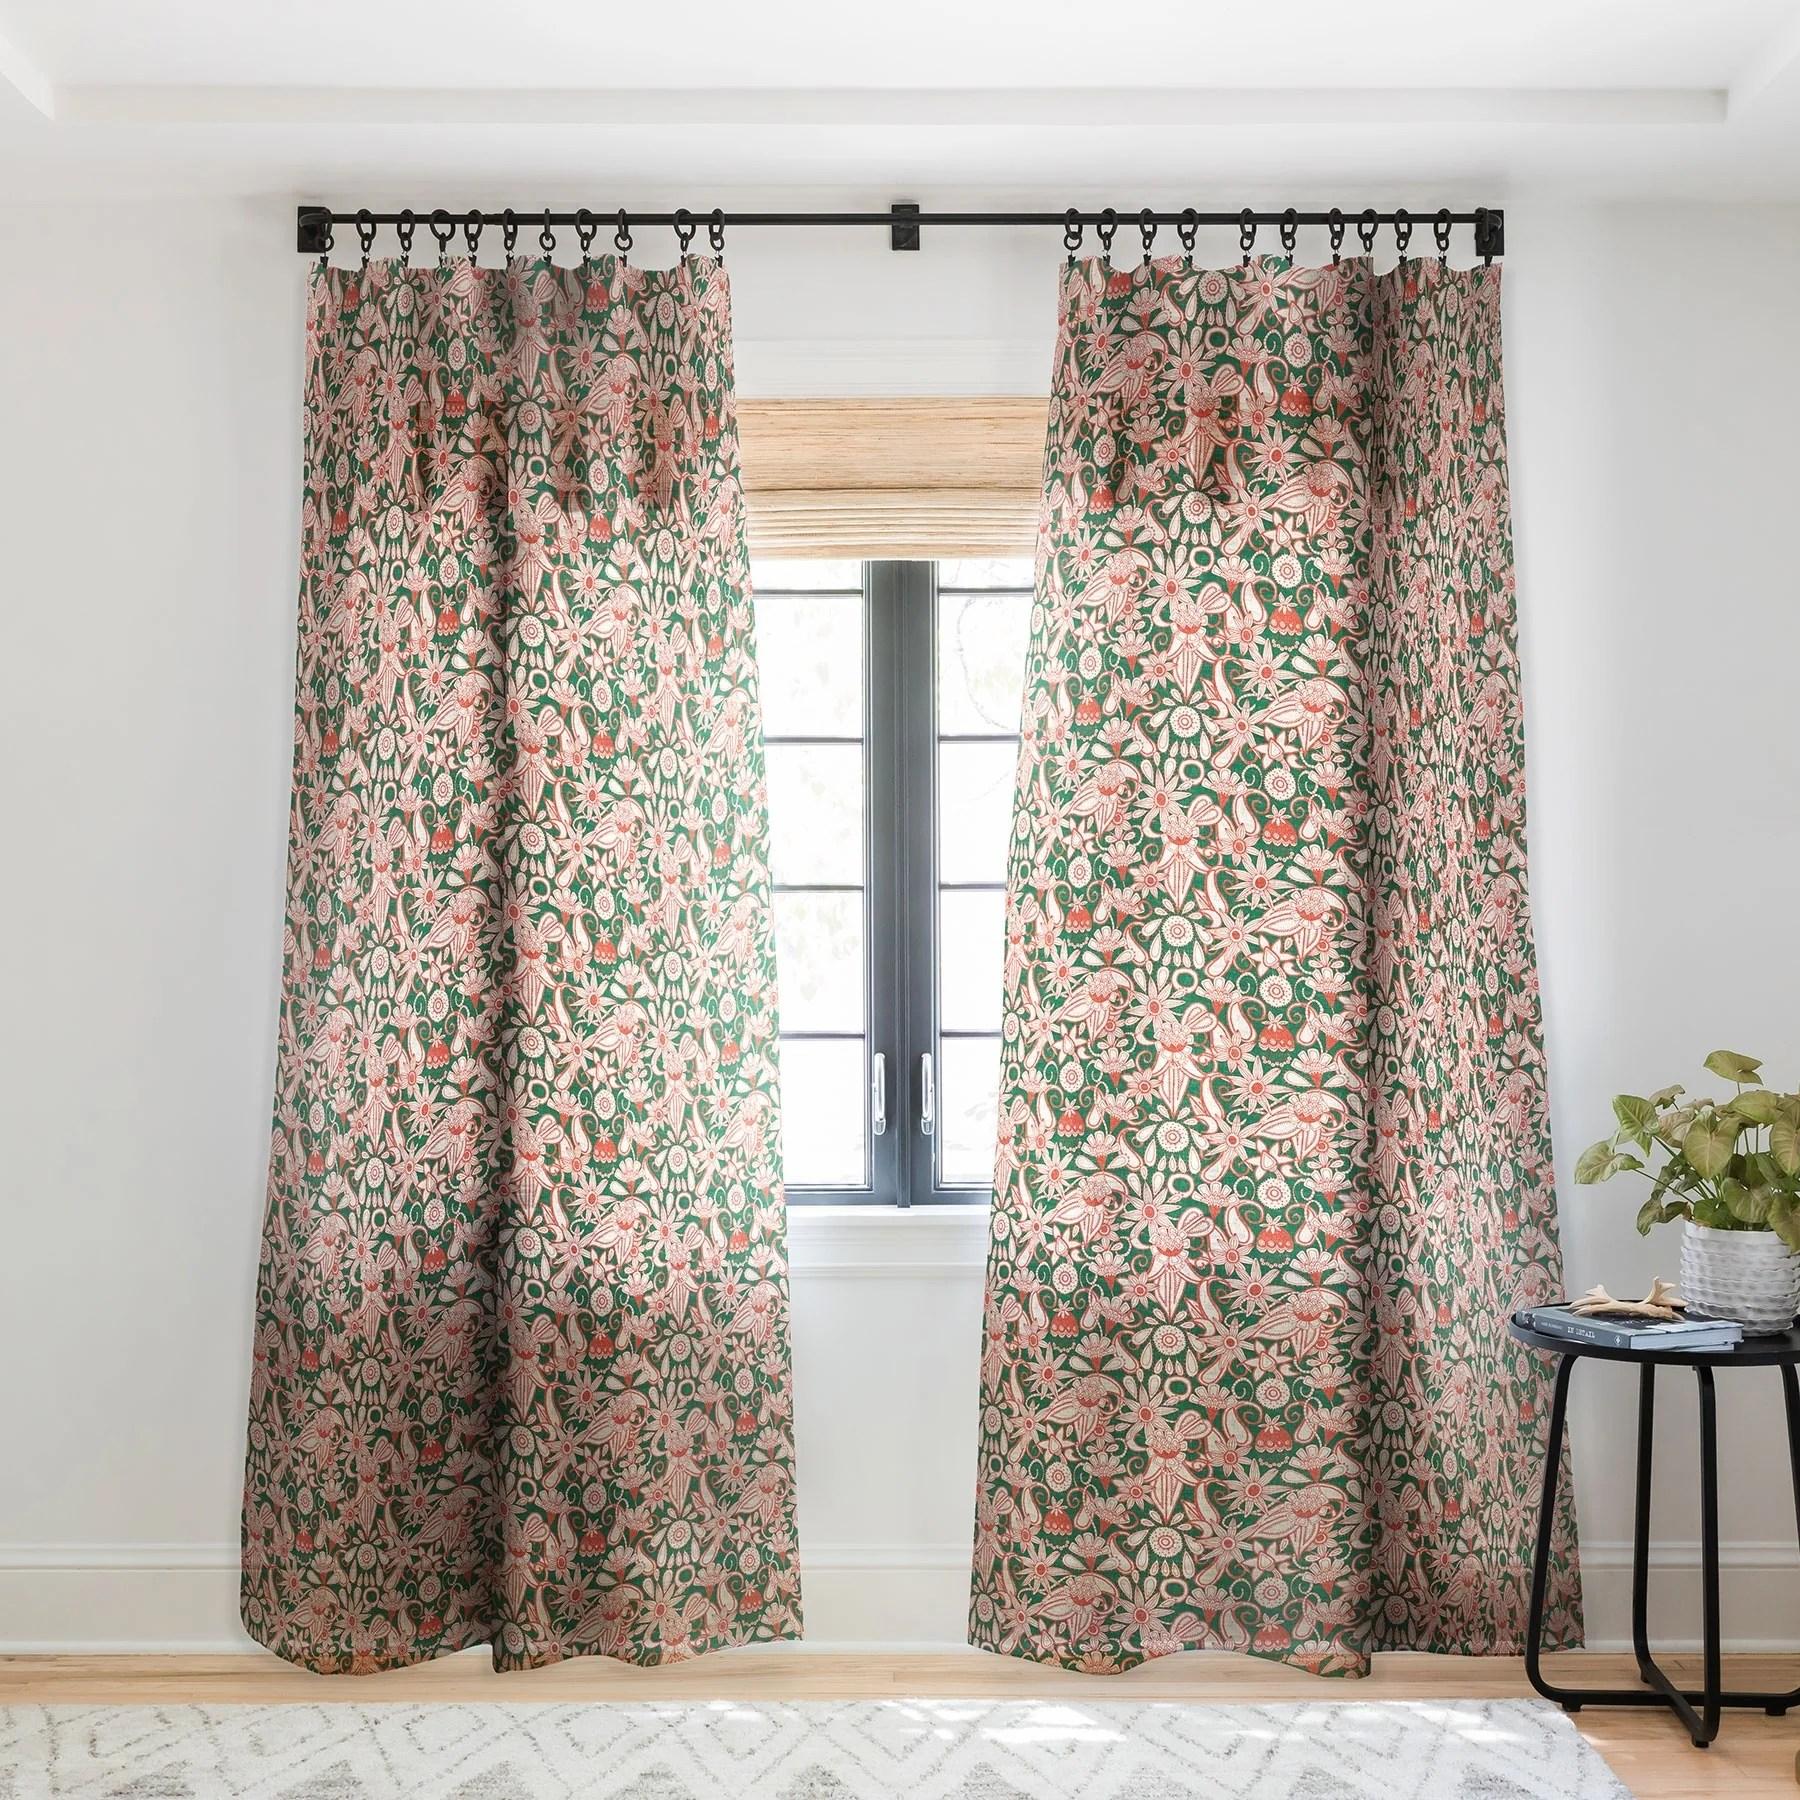 sharon turner sarilmak green orange single panel sheer curtain 50 x 84